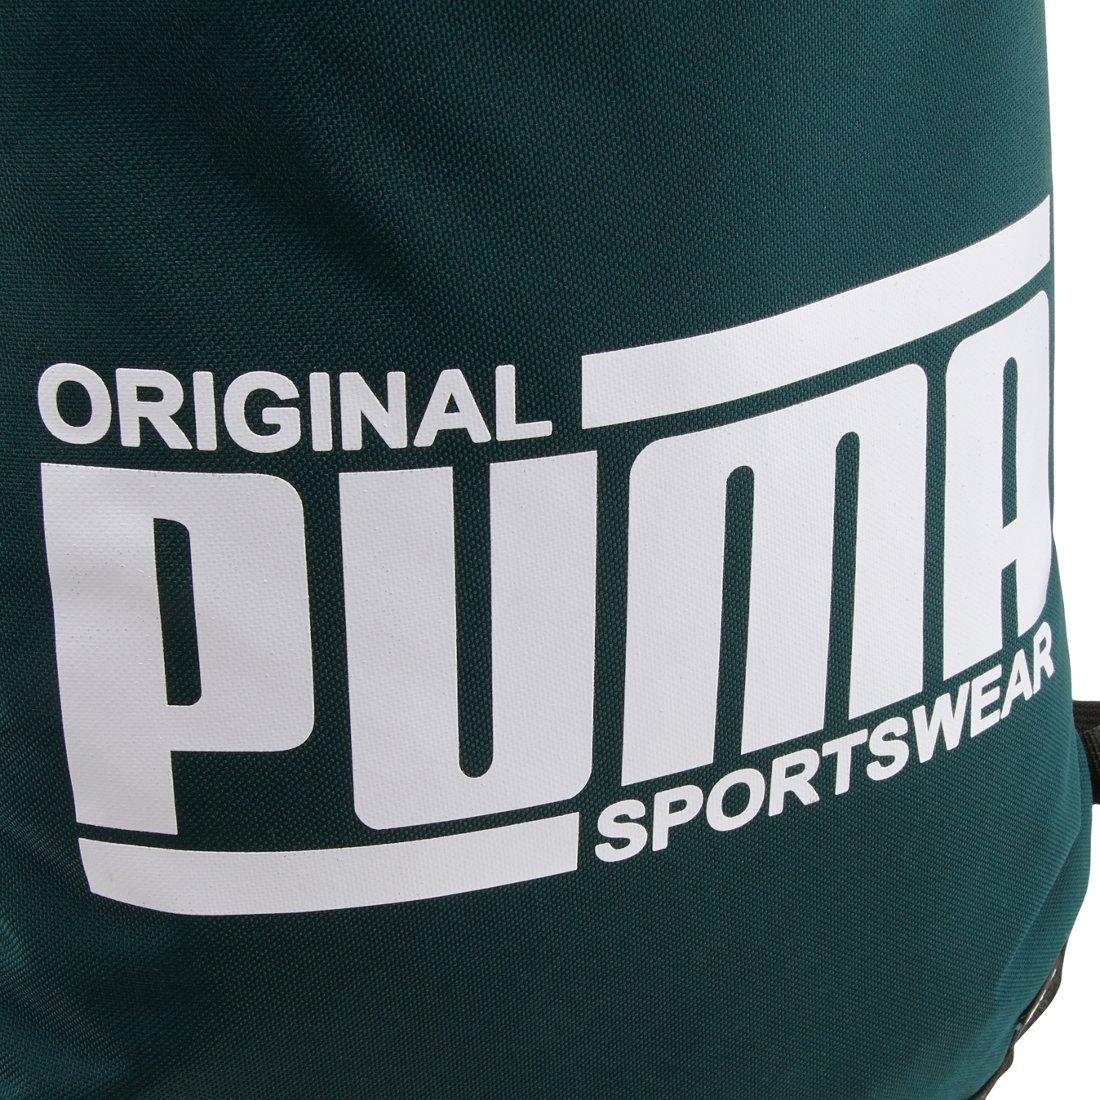 cb2444b4c28f1 Puma Sole Smart Bag Sportbeutel 48 cm - koffer-direkt.de